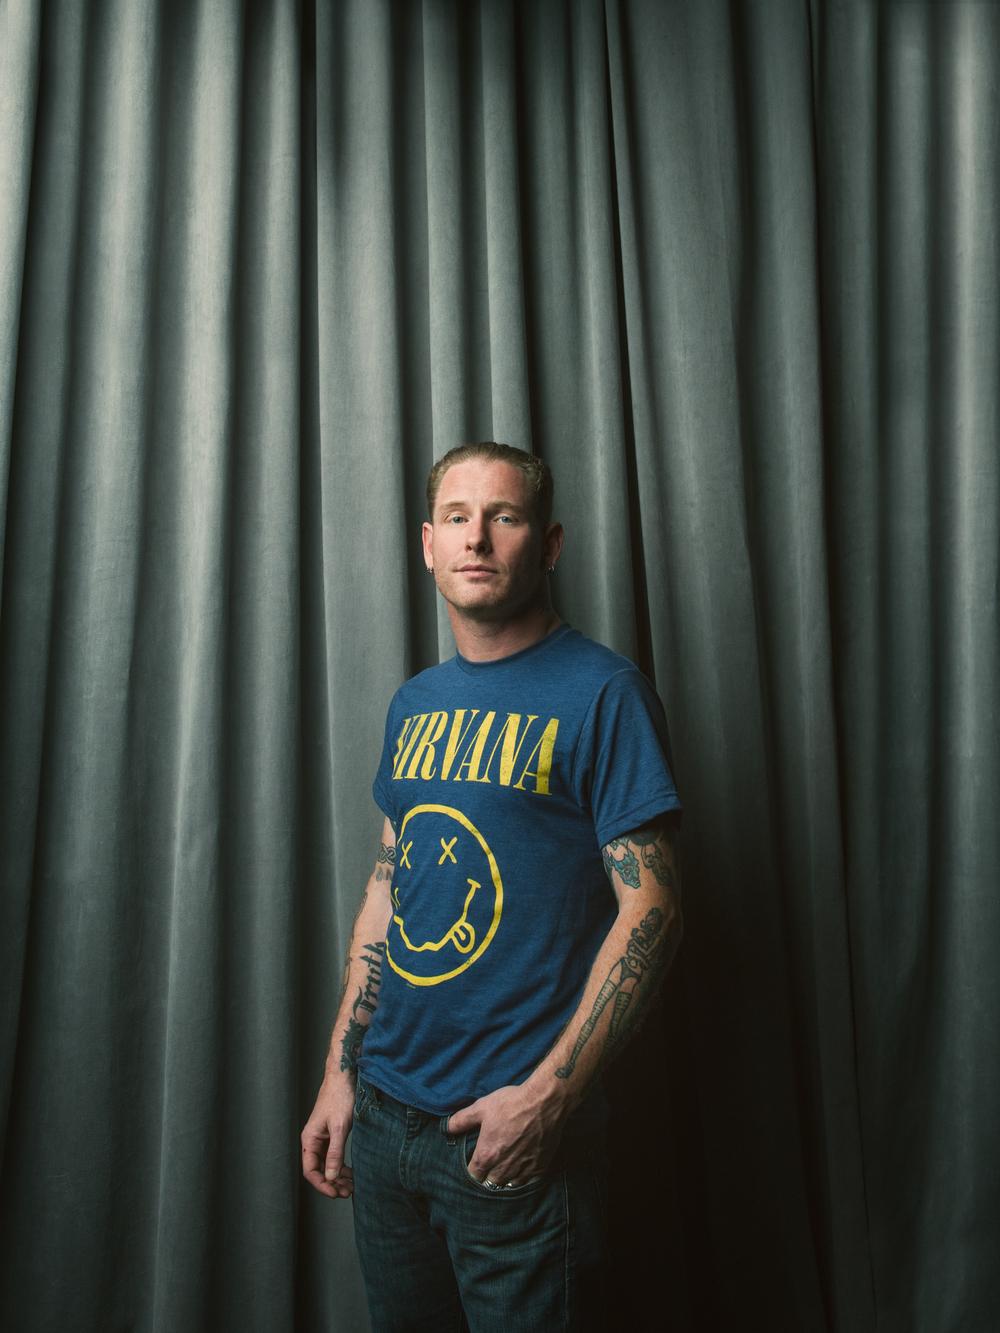 Corey Taylor, singer of Slipknot